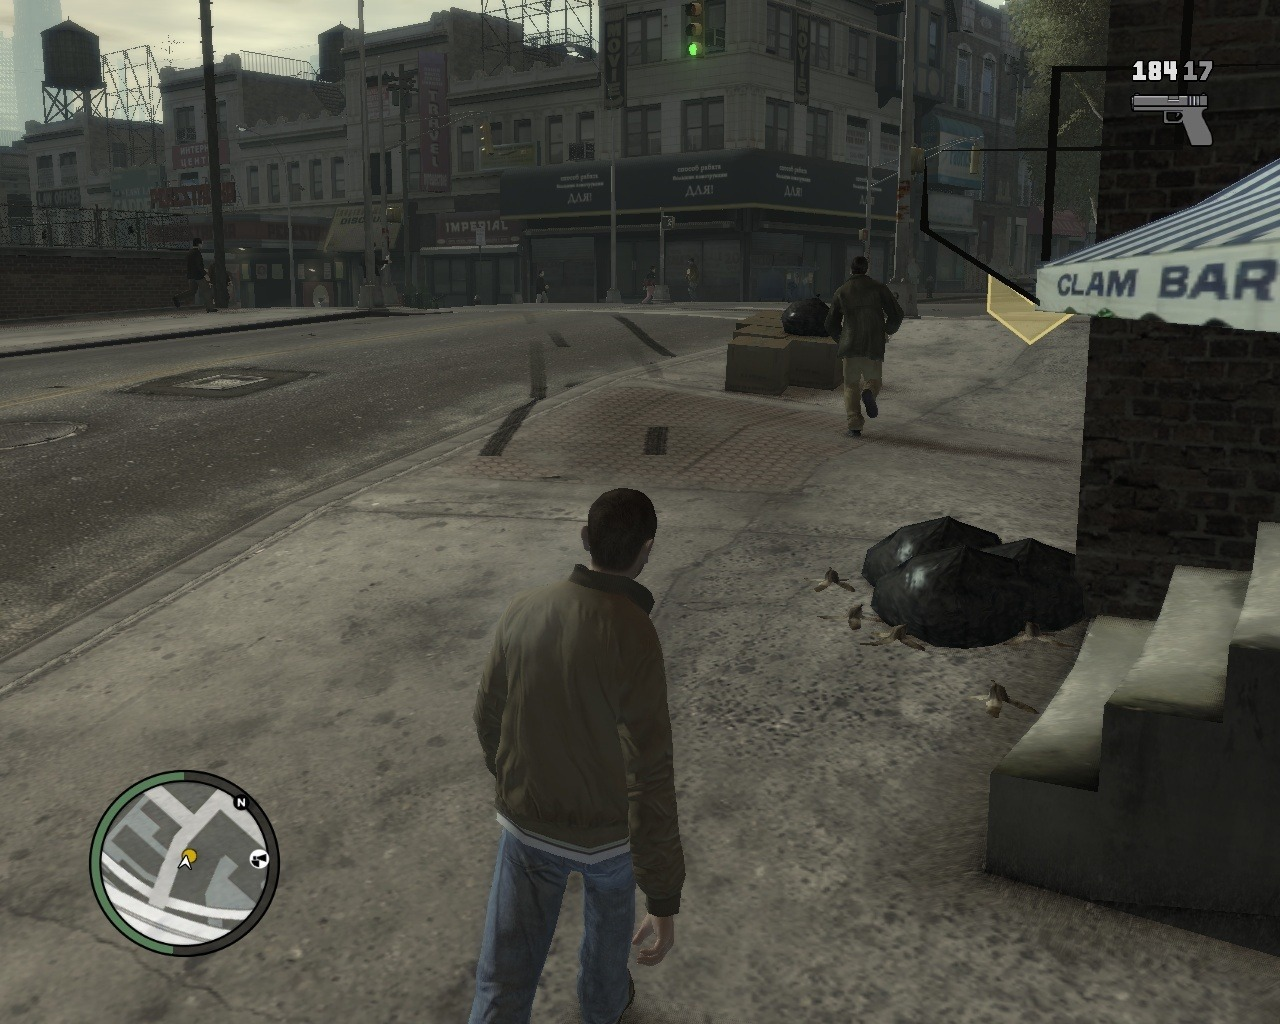 GTA IV Complete Edition Crack